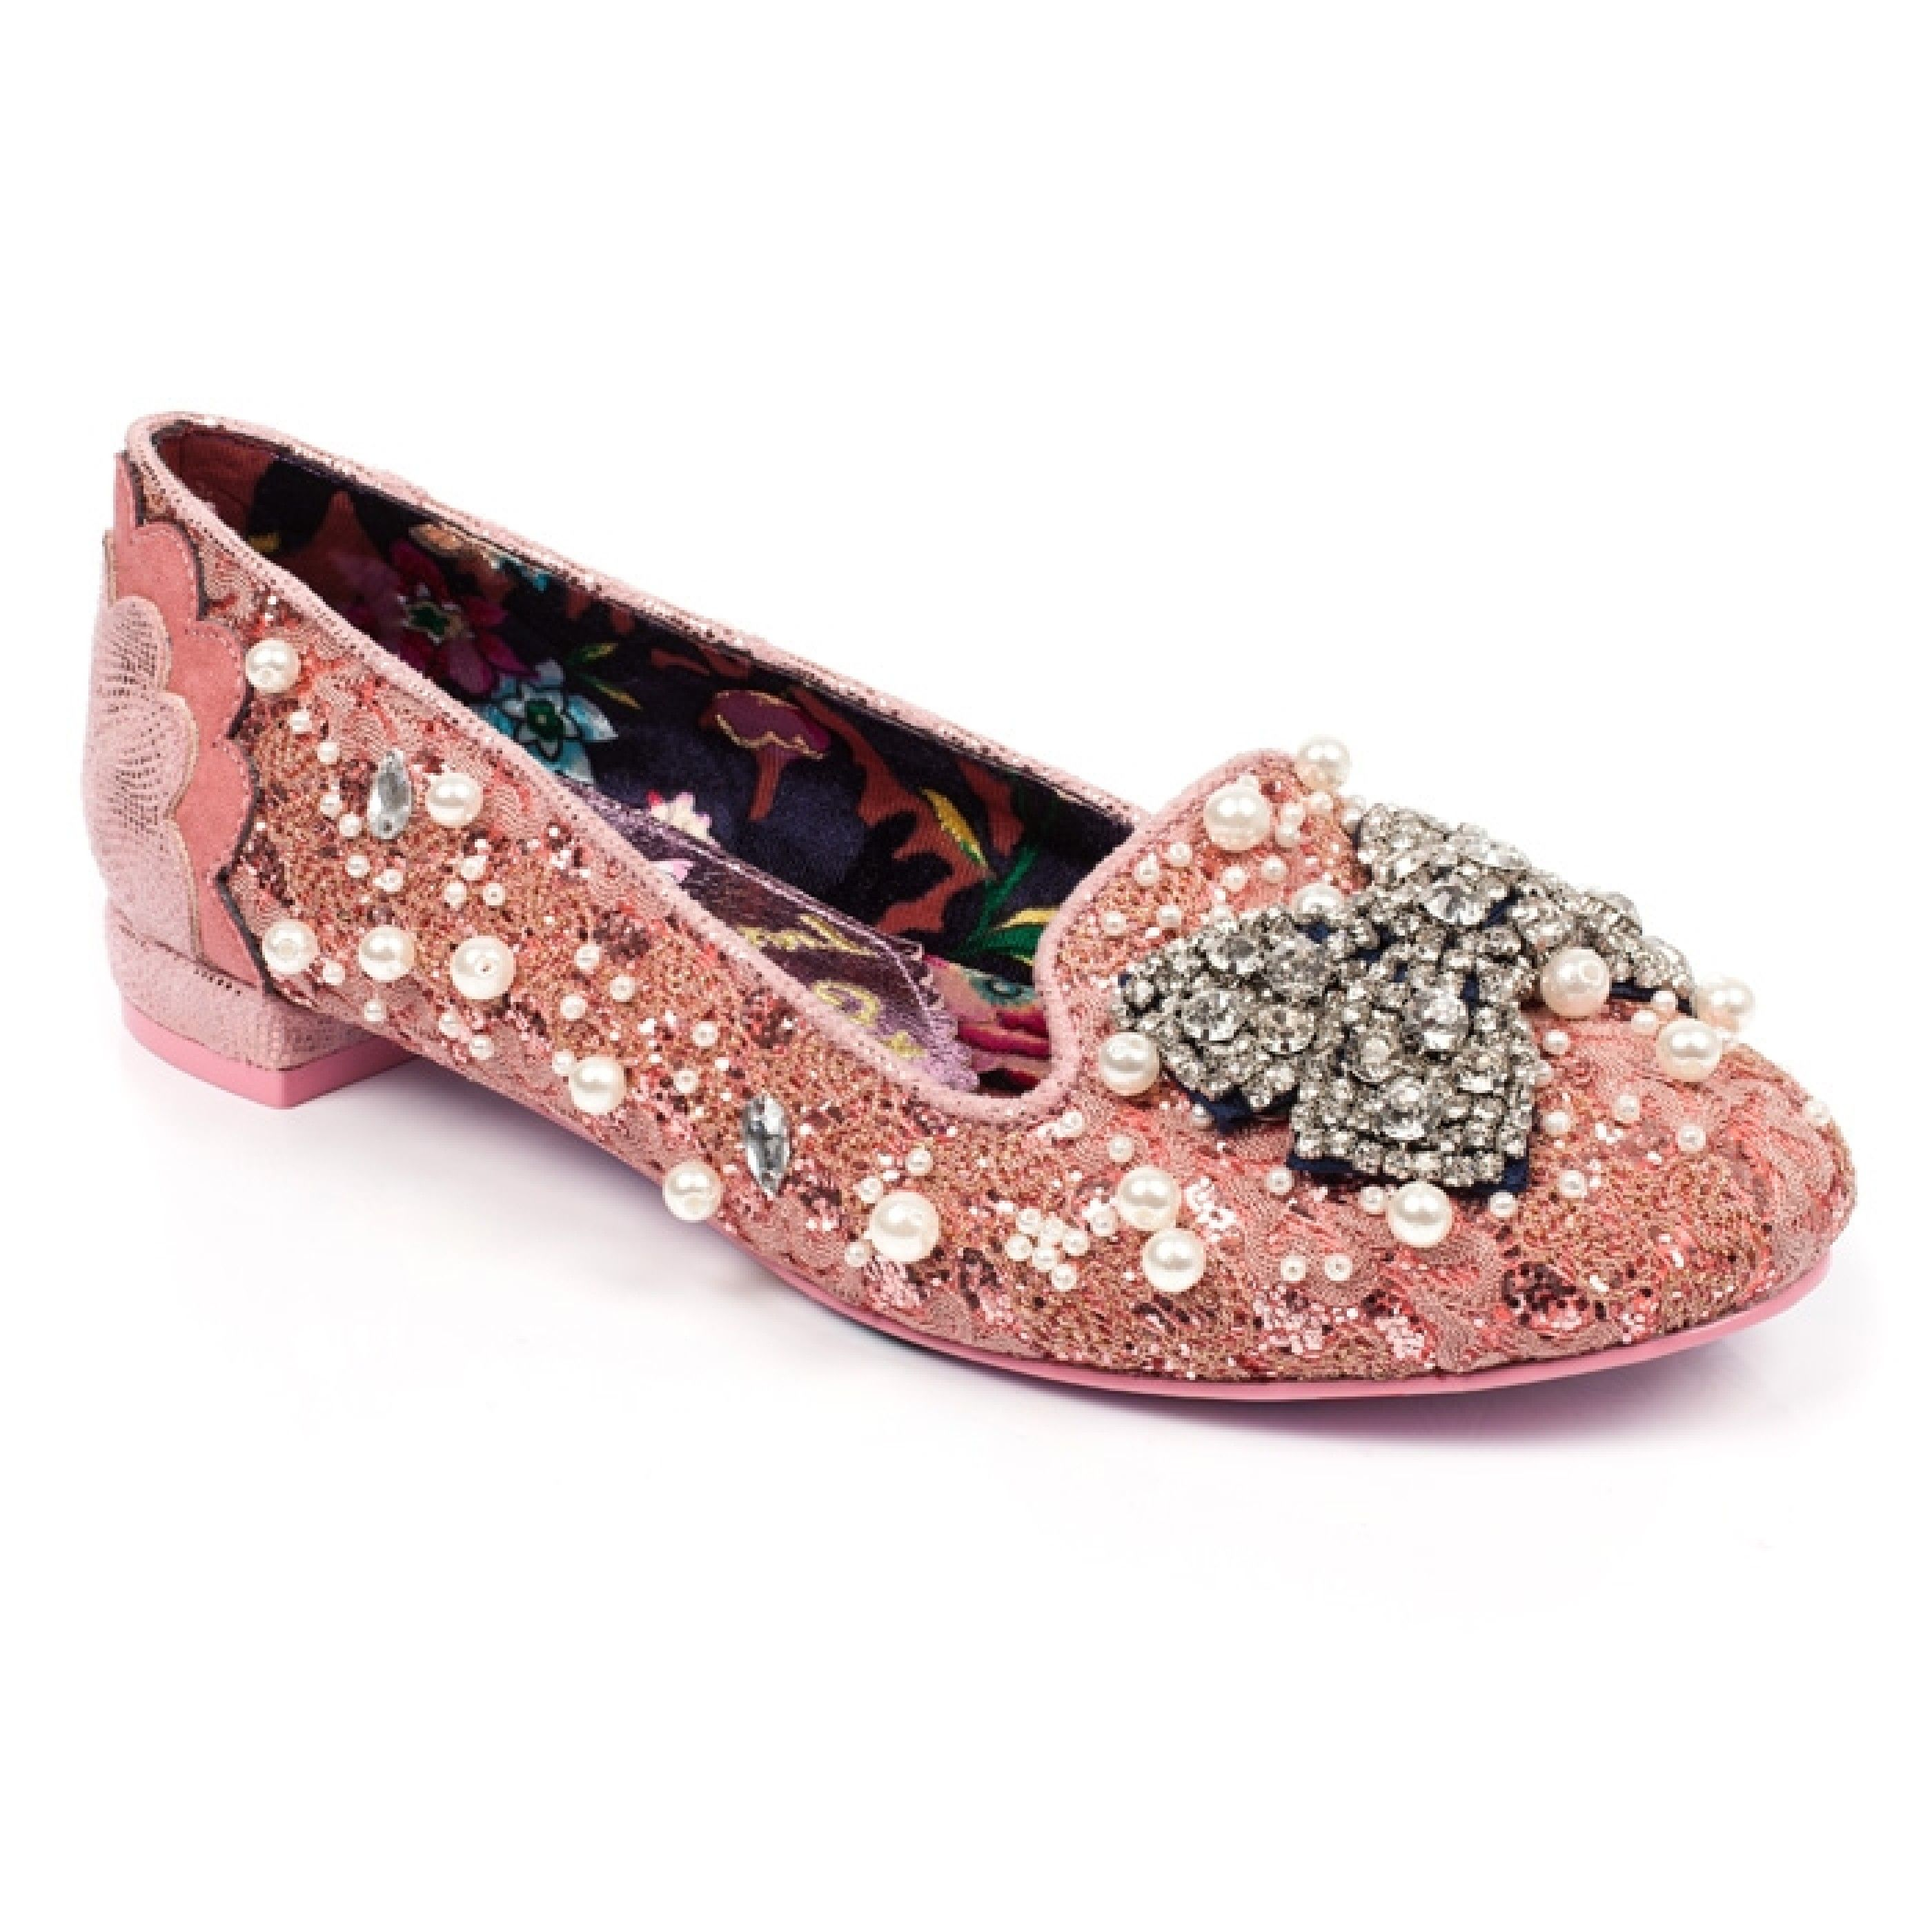 Irregular Choice Dew Drops Embellished Flat - , Women